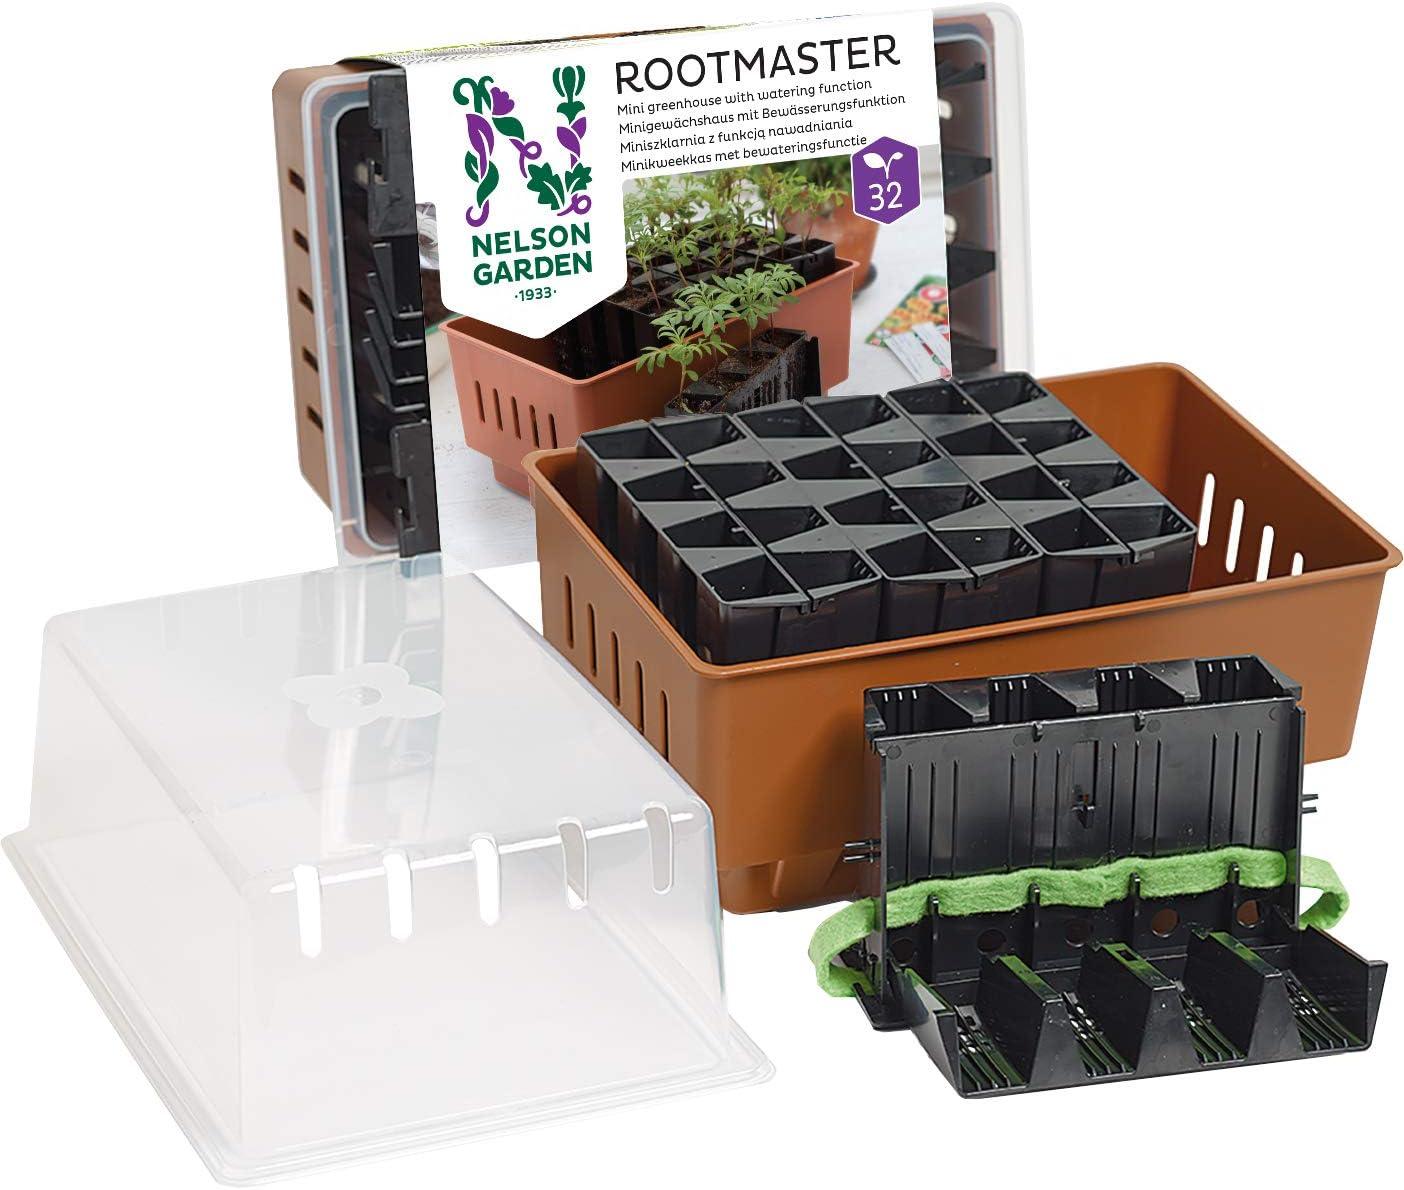 Nelson Garden 1933 Jardinera de cultivo para 32 plantas – Mini invernadero con riego (Mini Greenhouse Rootmaster 32 conectores)